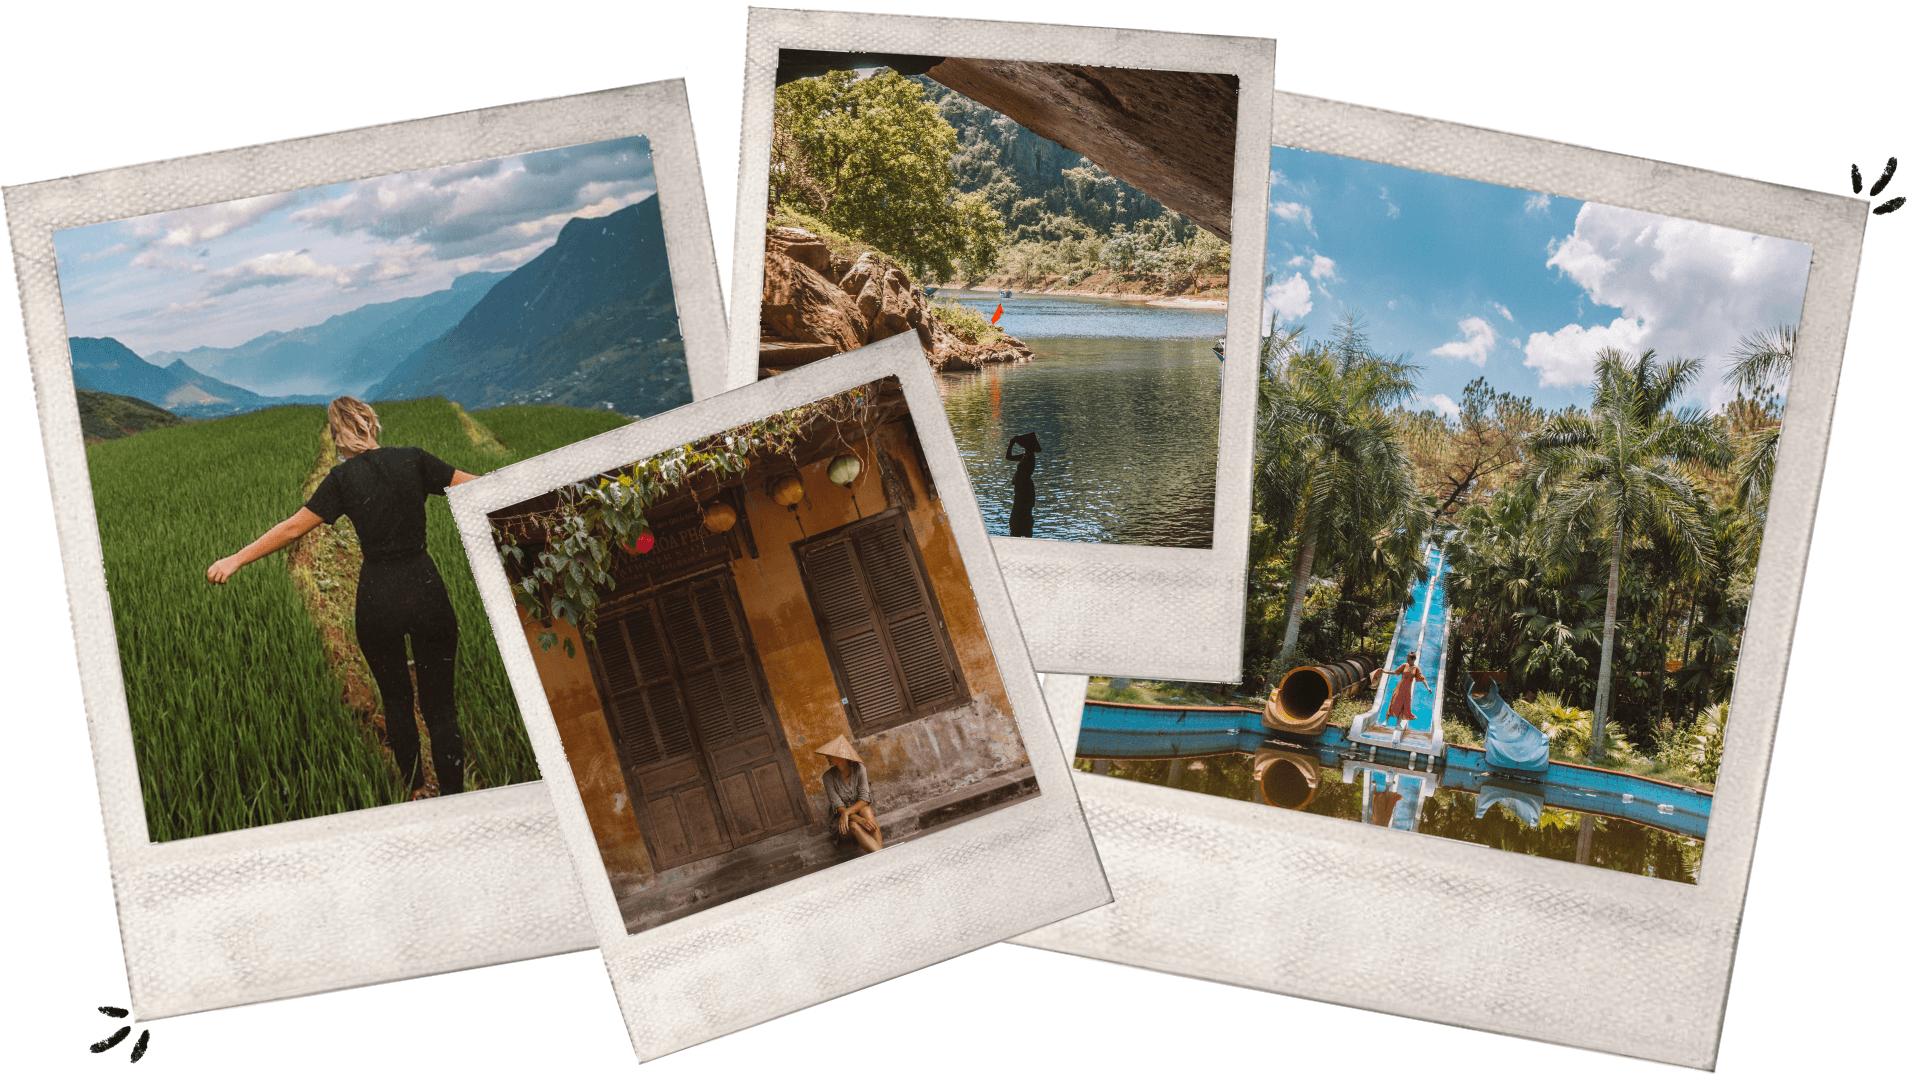 Vietnam travel guide bucketlist itinerary